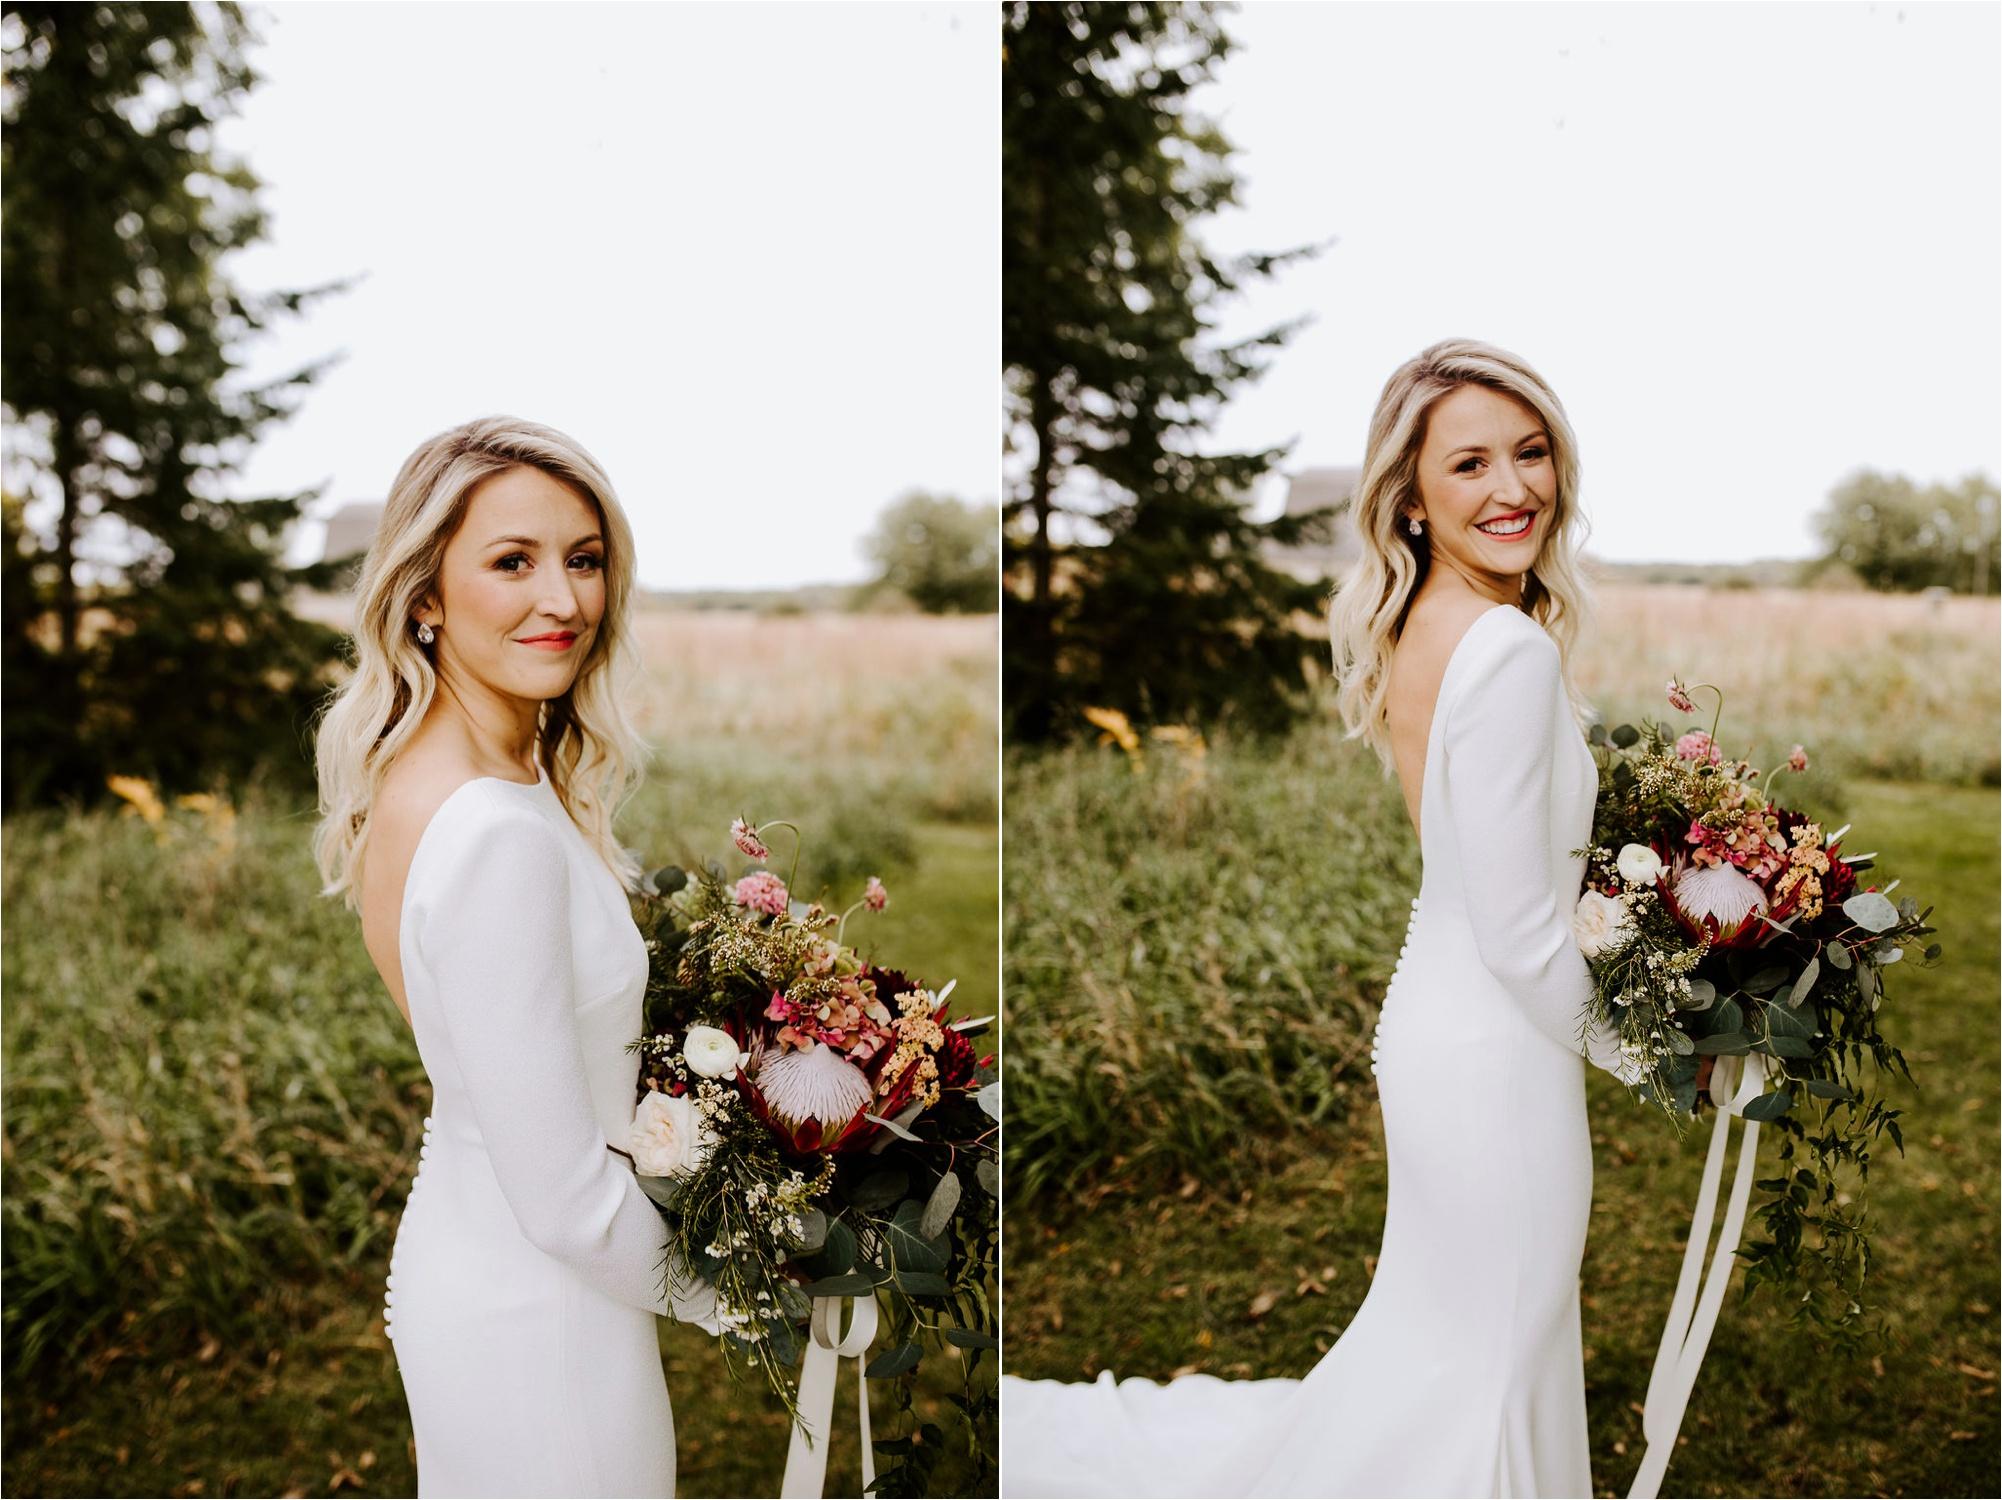 Minnesota Outdoor Family Farm Wedding Photographer_3819.jpg